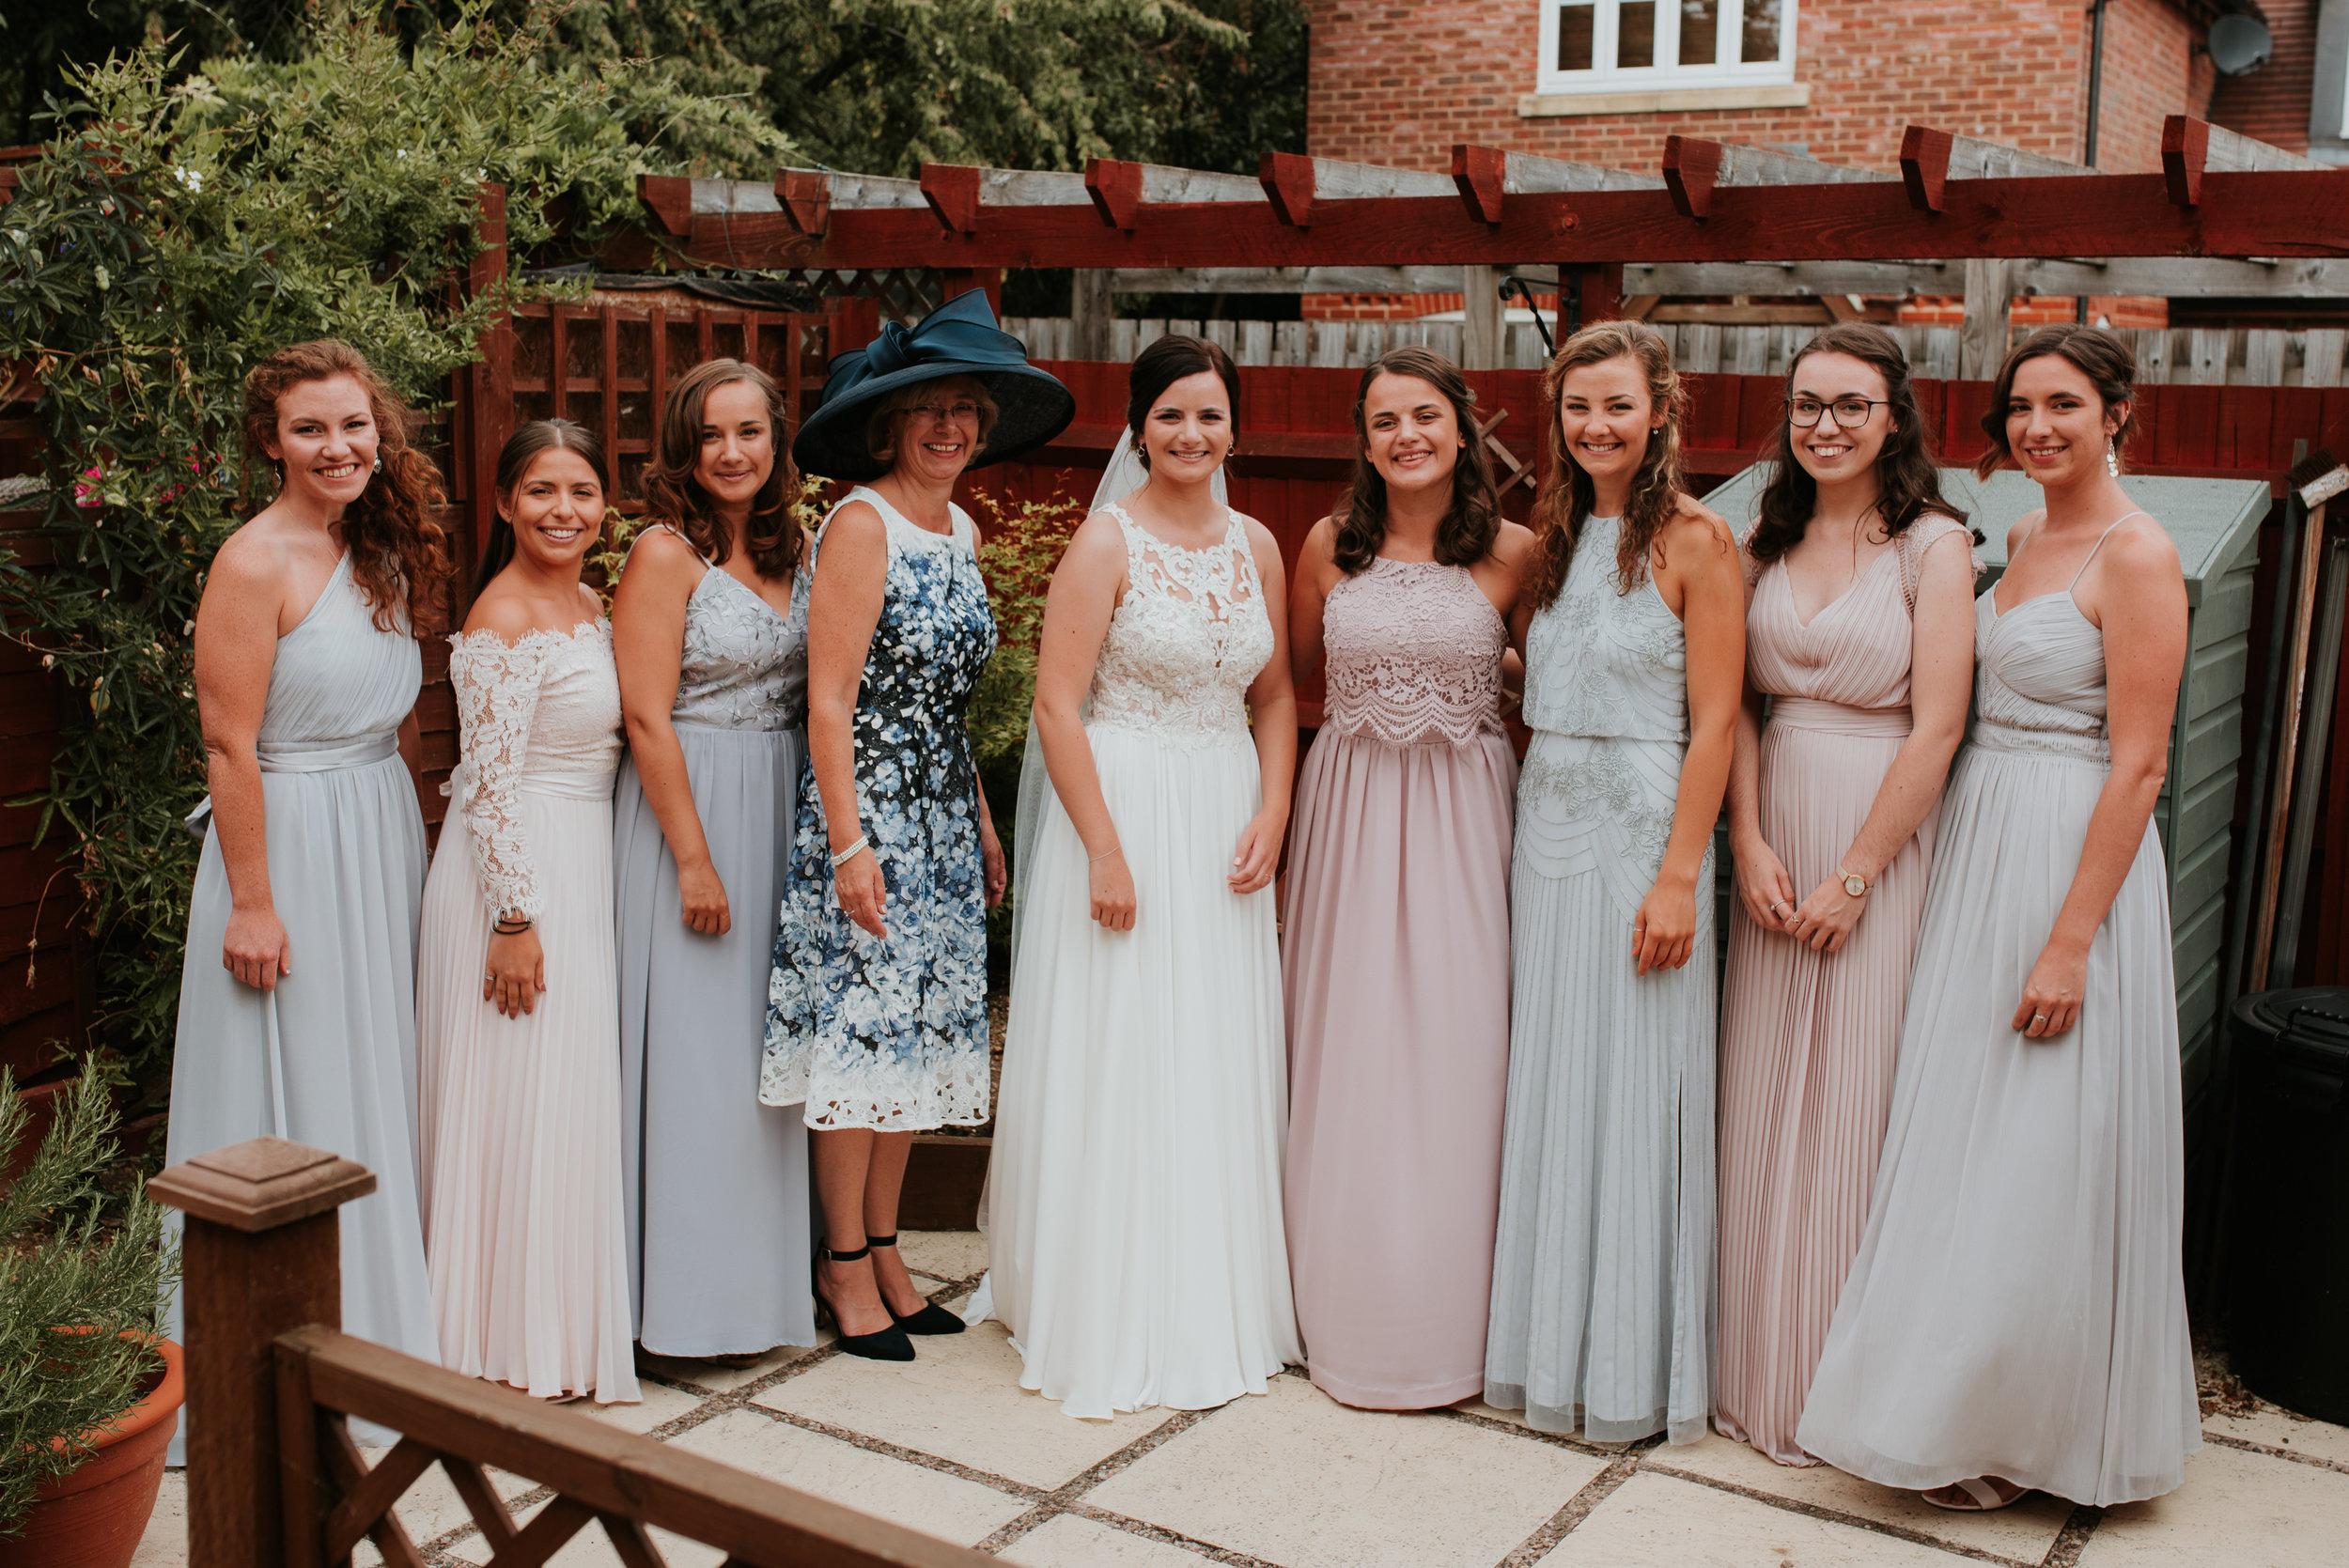 Wokingham Bride with Bridesmaids